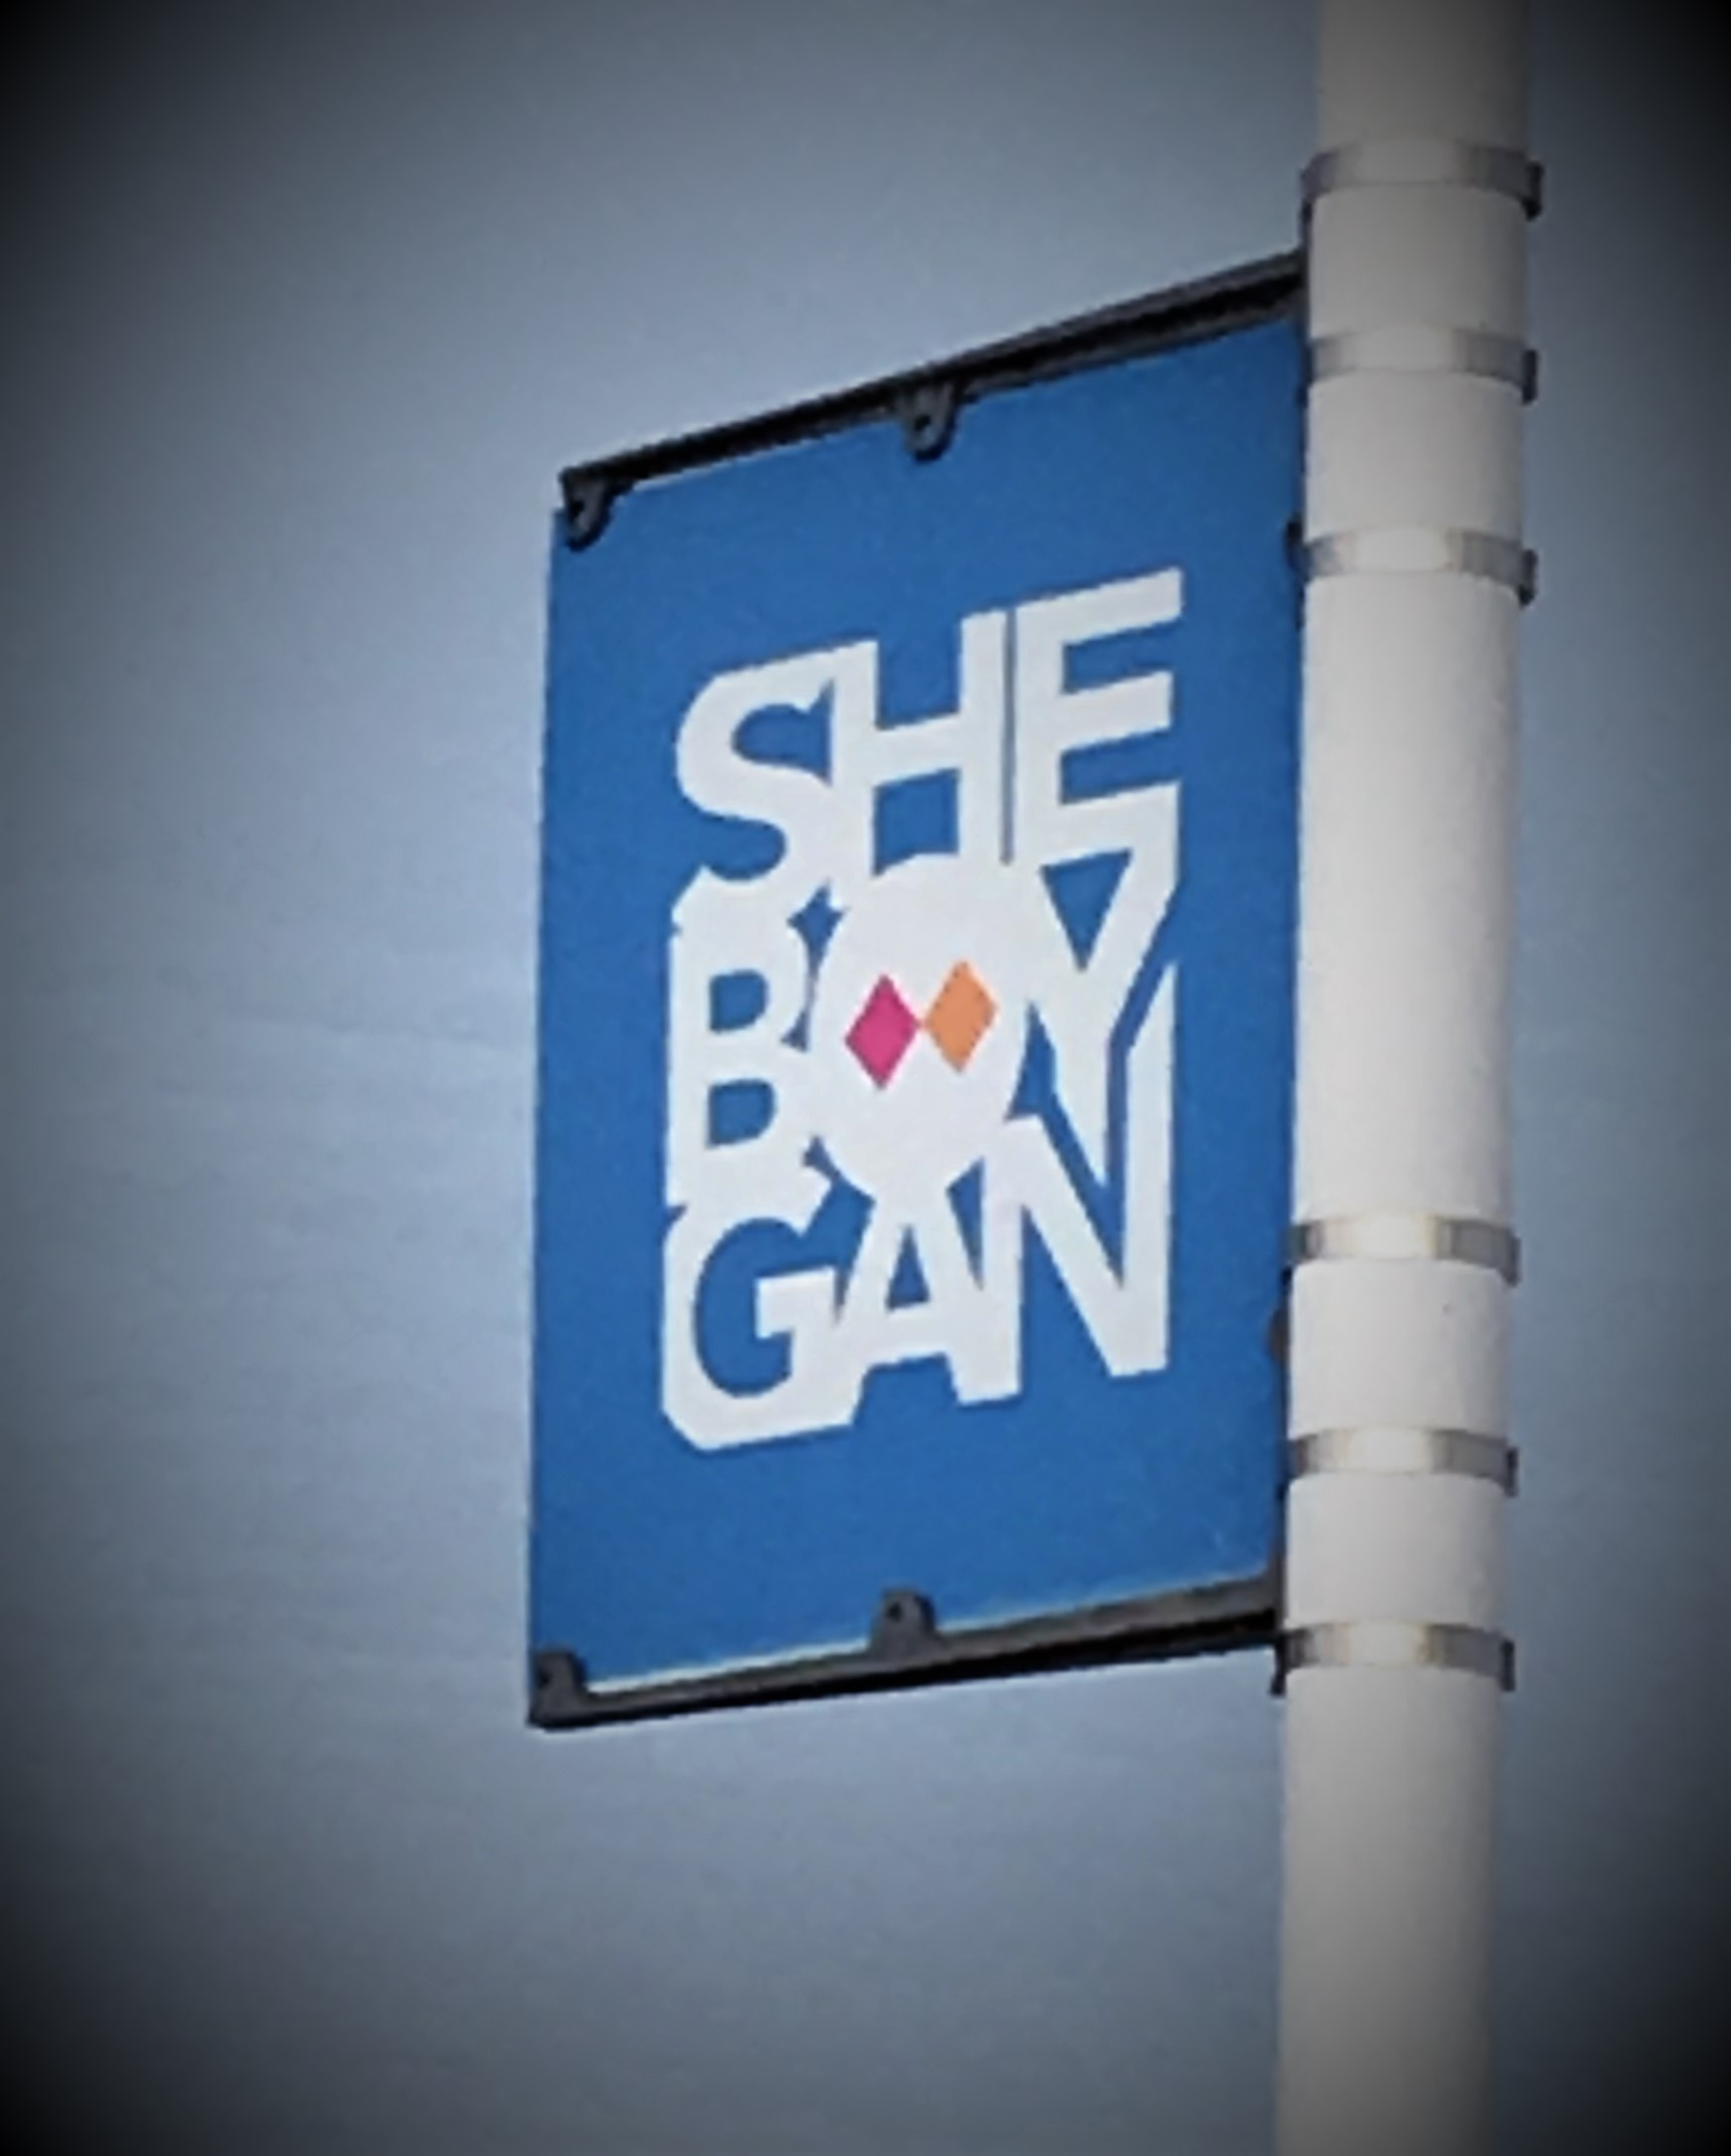 City of Sheboygan to Break Ground on New Enterprise Park